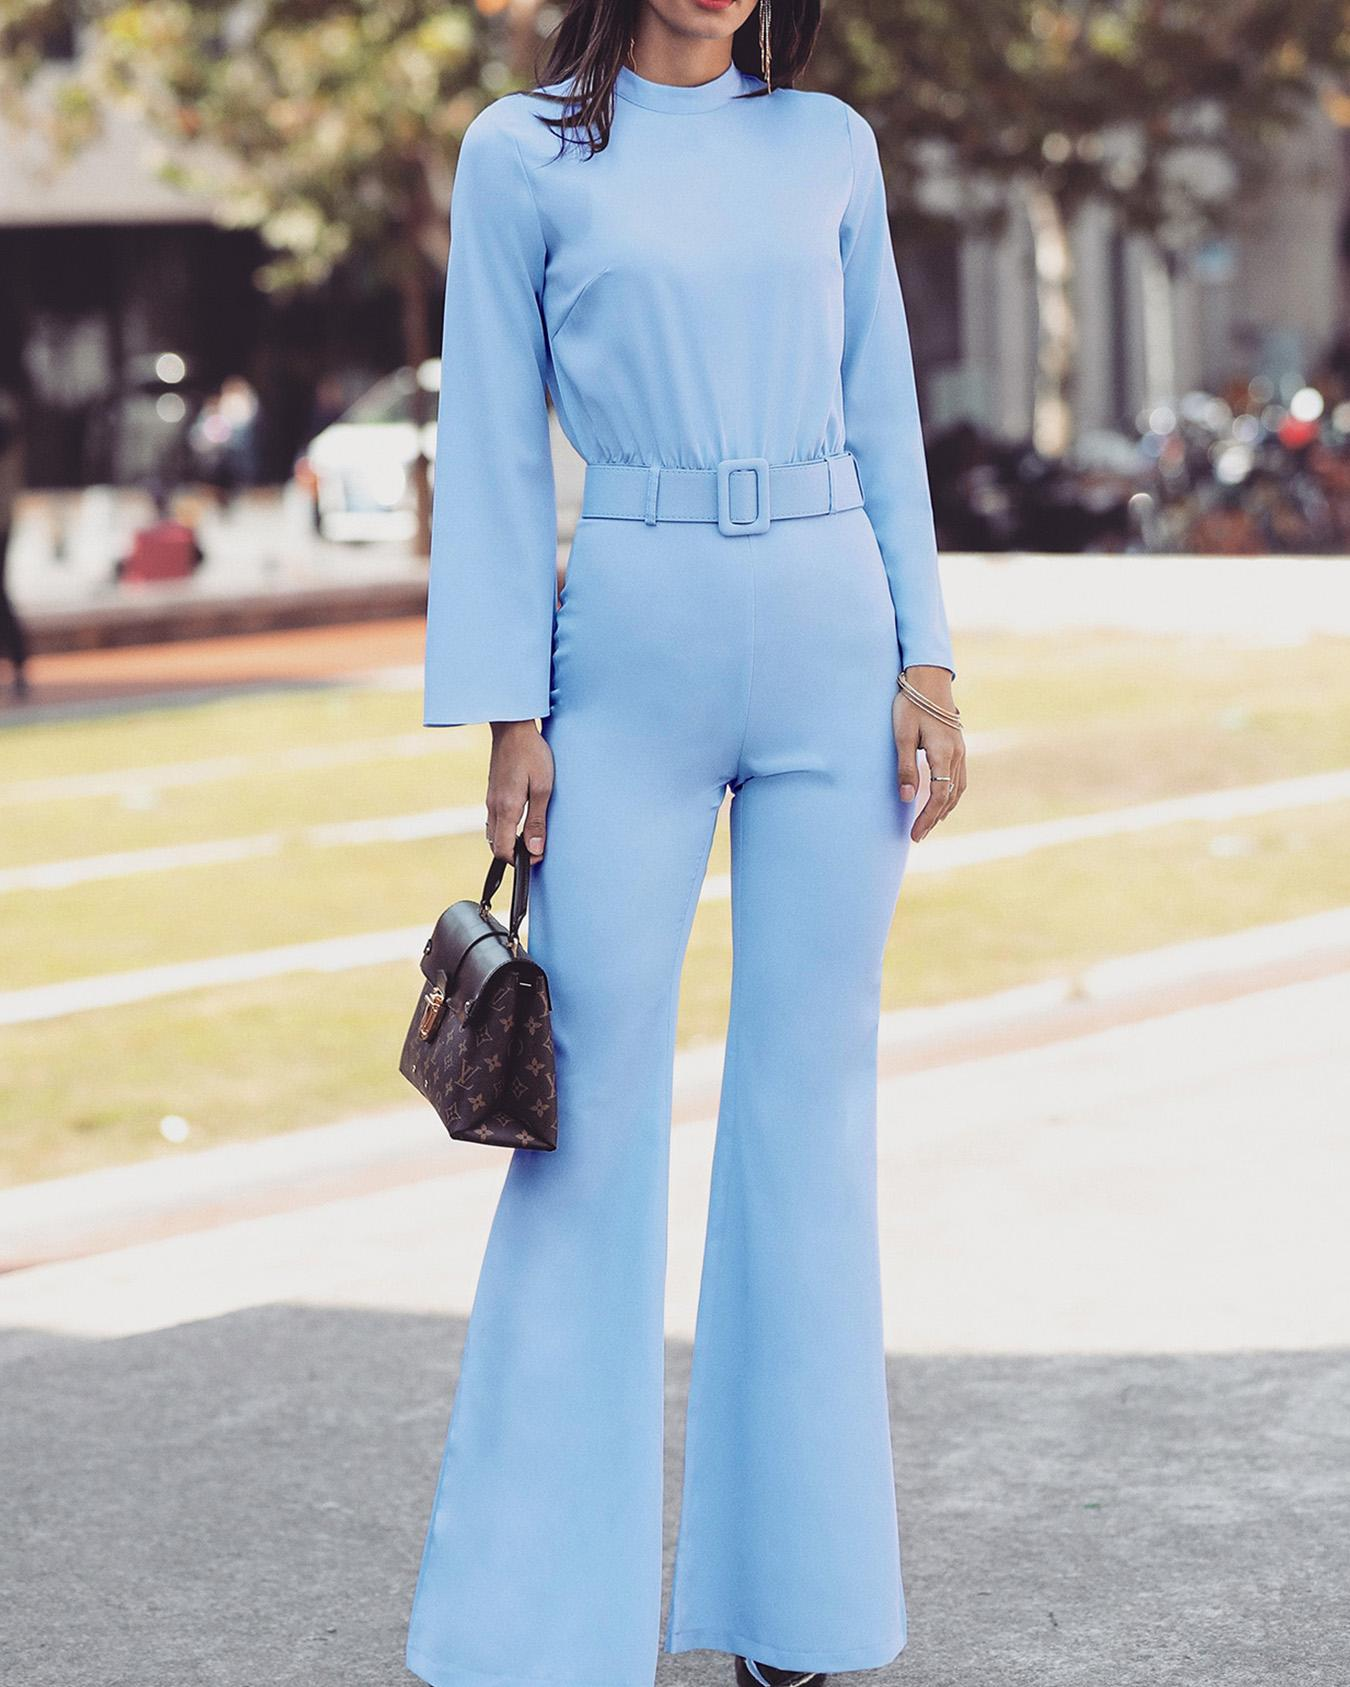 High Neck Bell Sleeve Wide Leg Jumpsuit With Belt